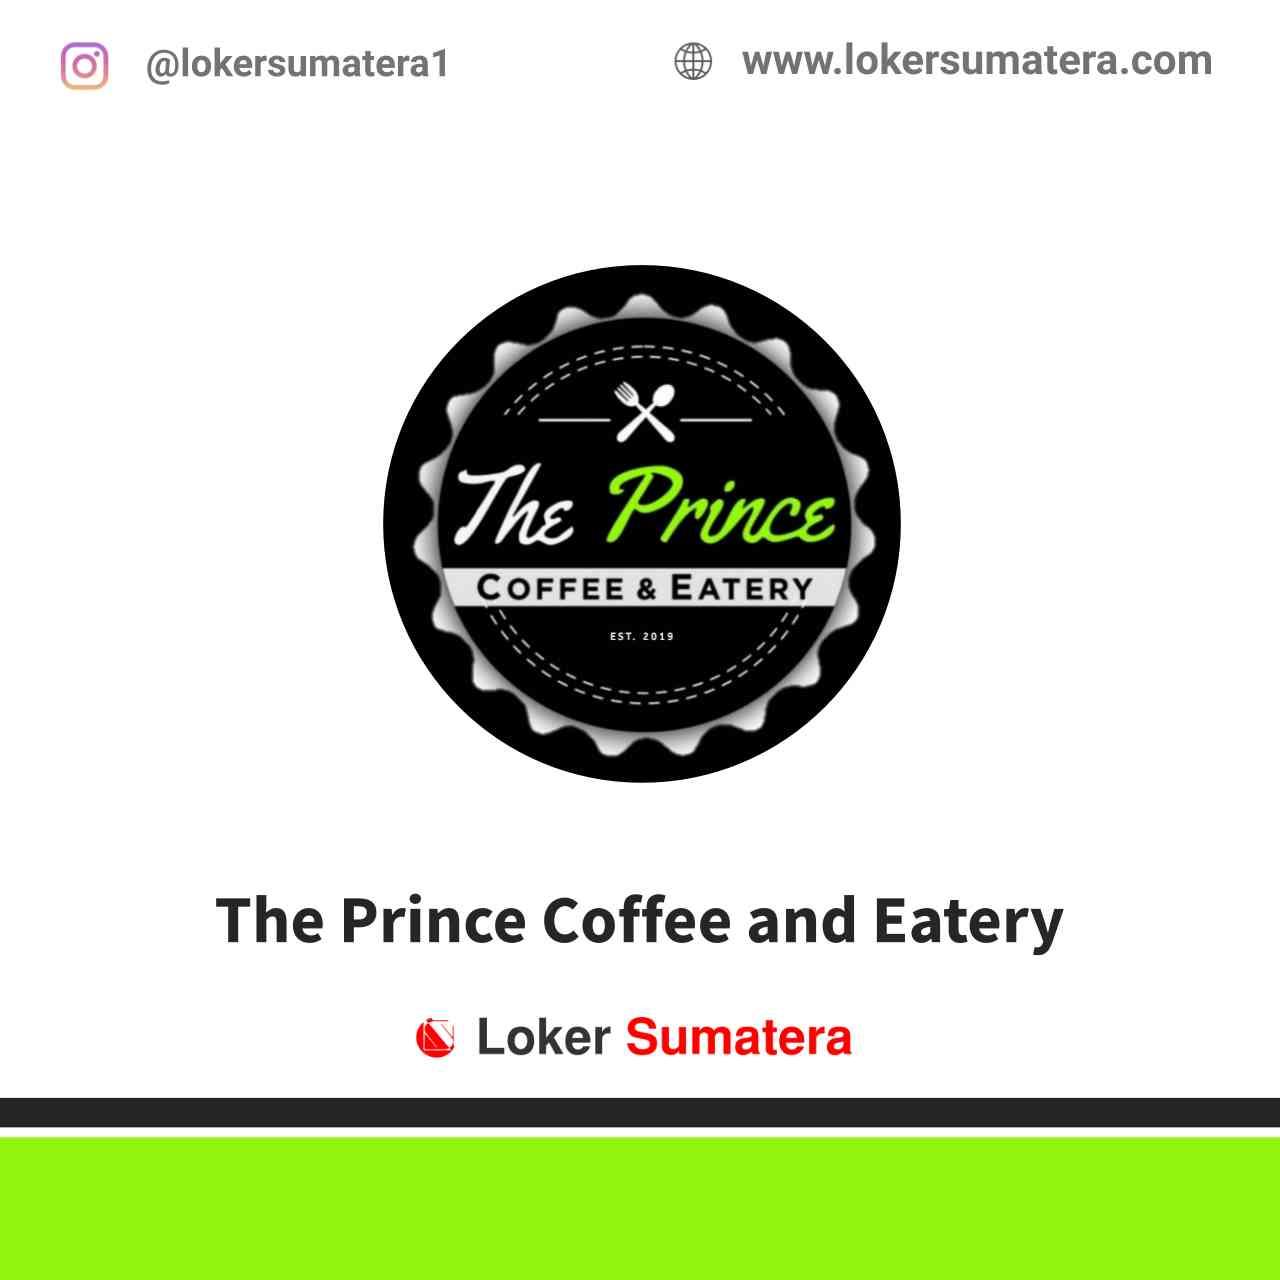 The Prince Coffee and Eatery Pekanbaru